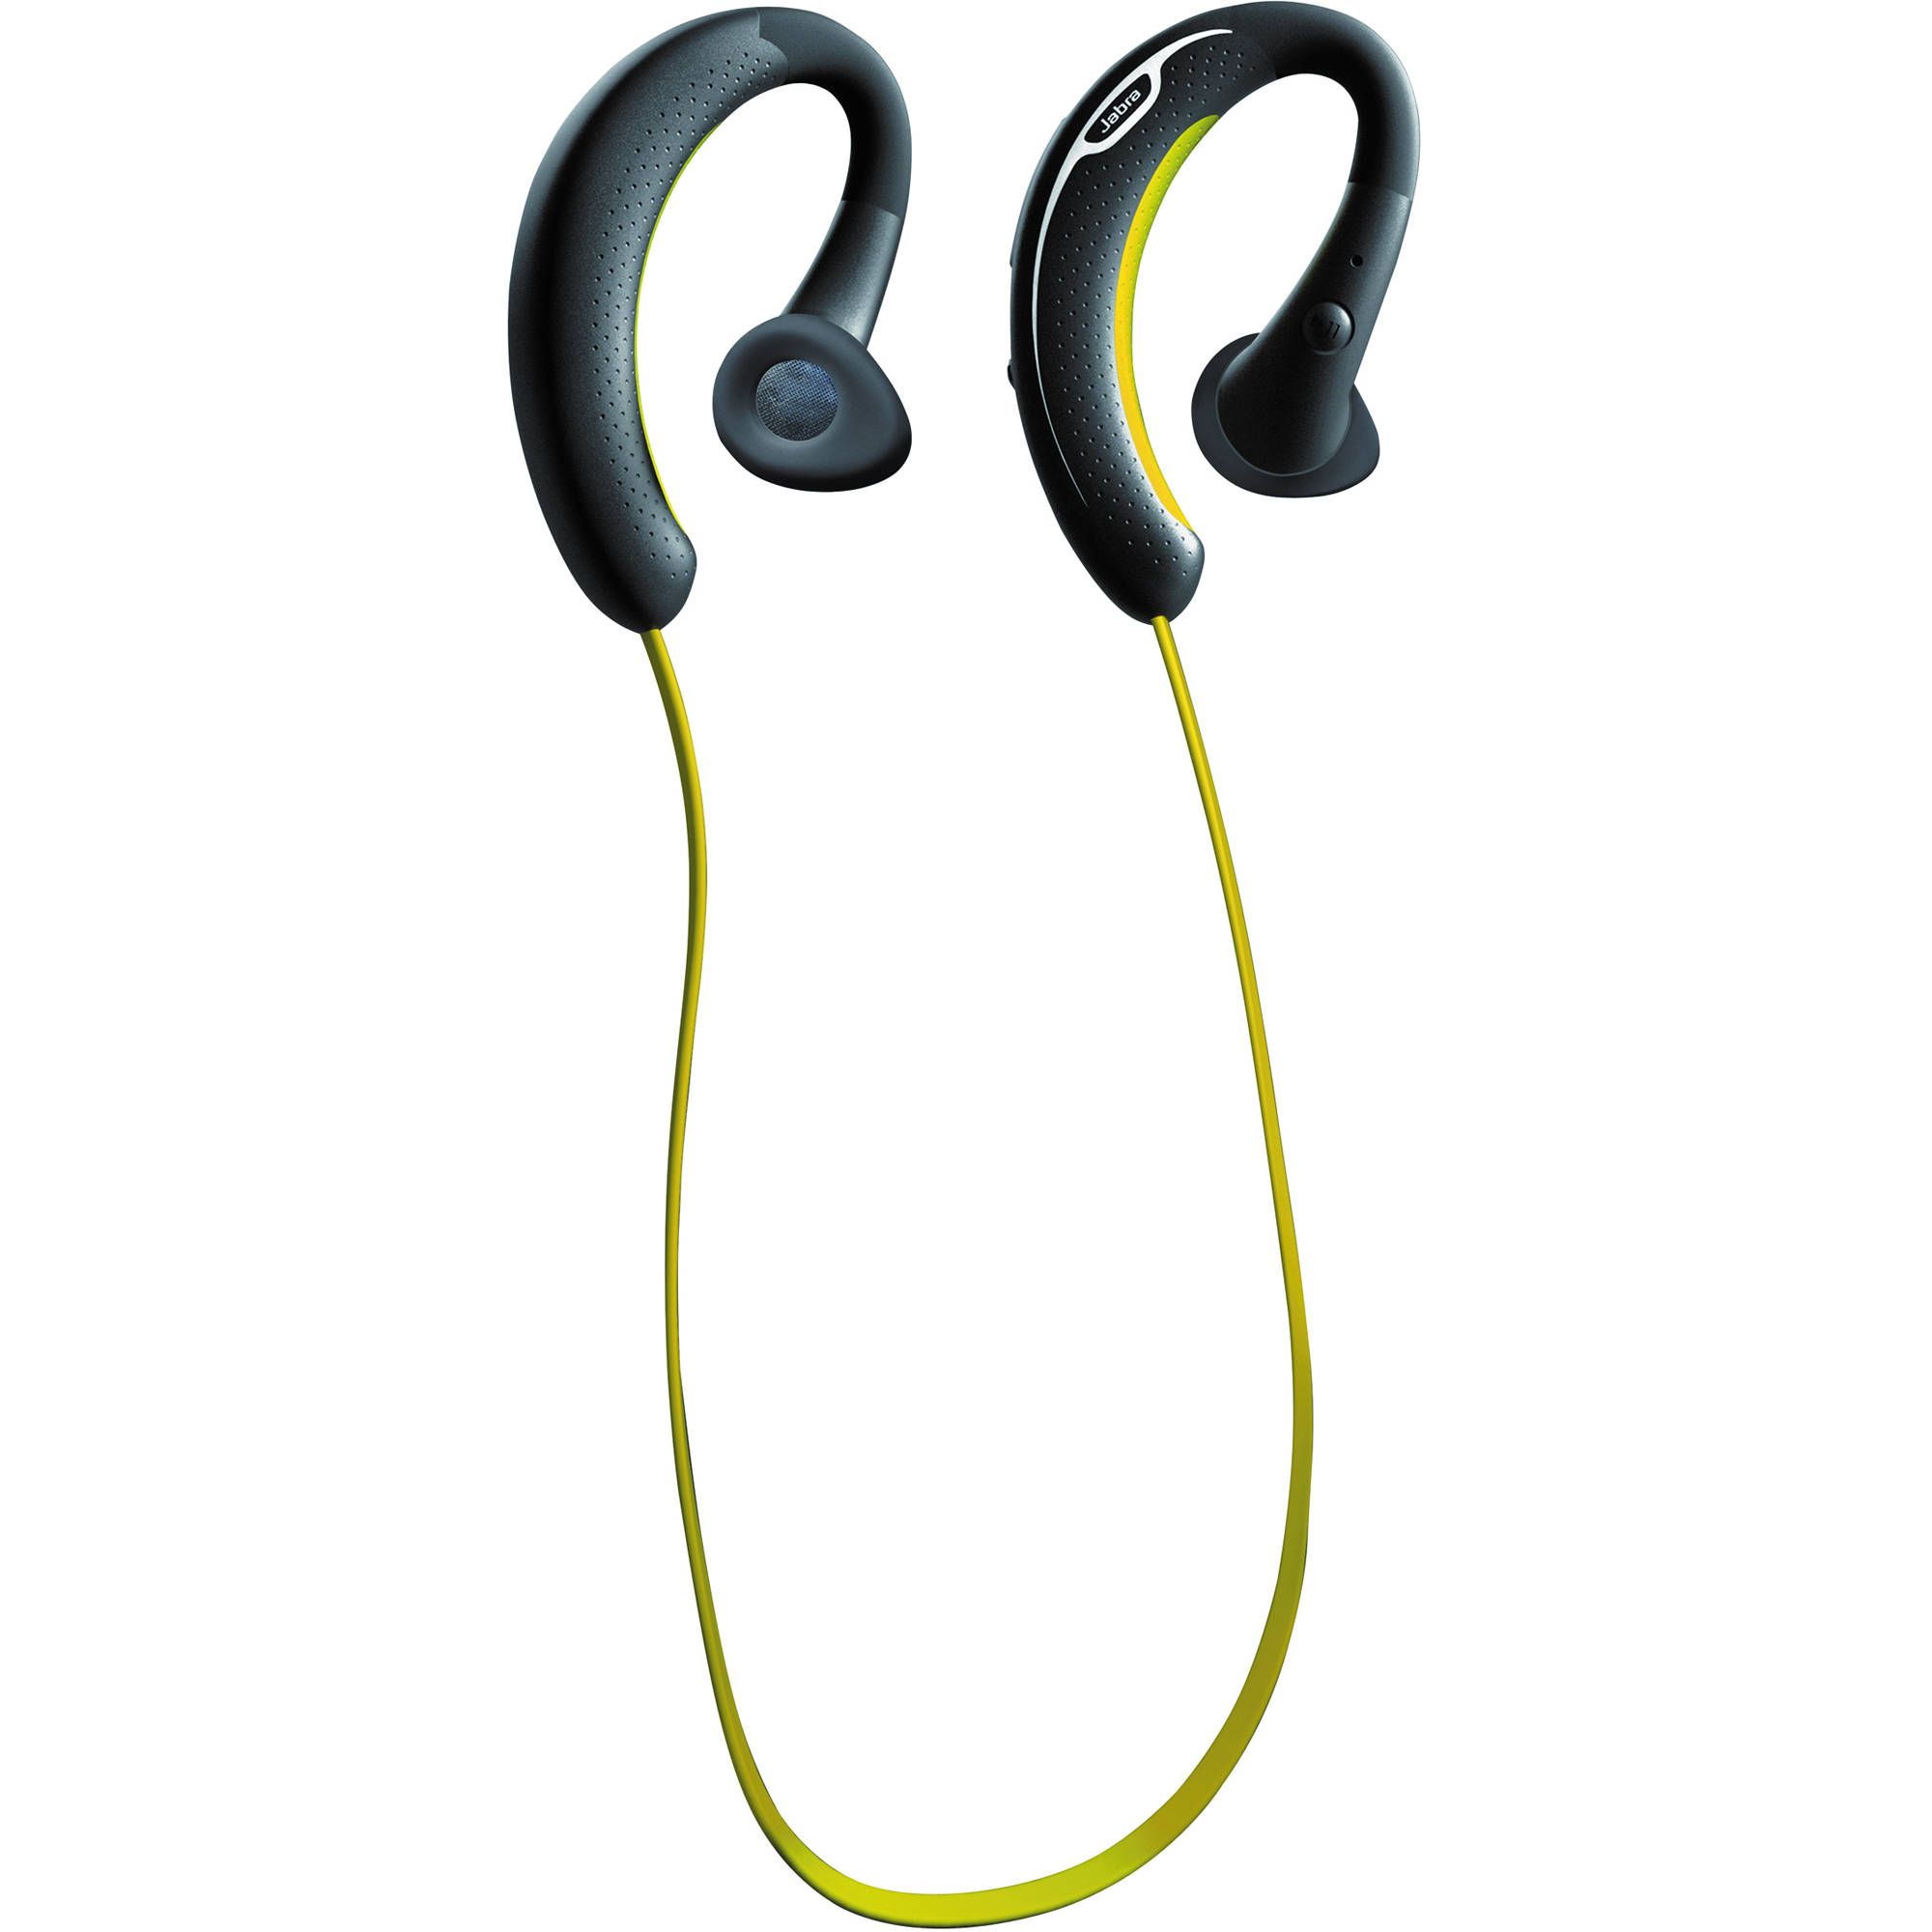 Jabra Sport Bluetooth Headset 100-96600000-02 B&H Photo Video